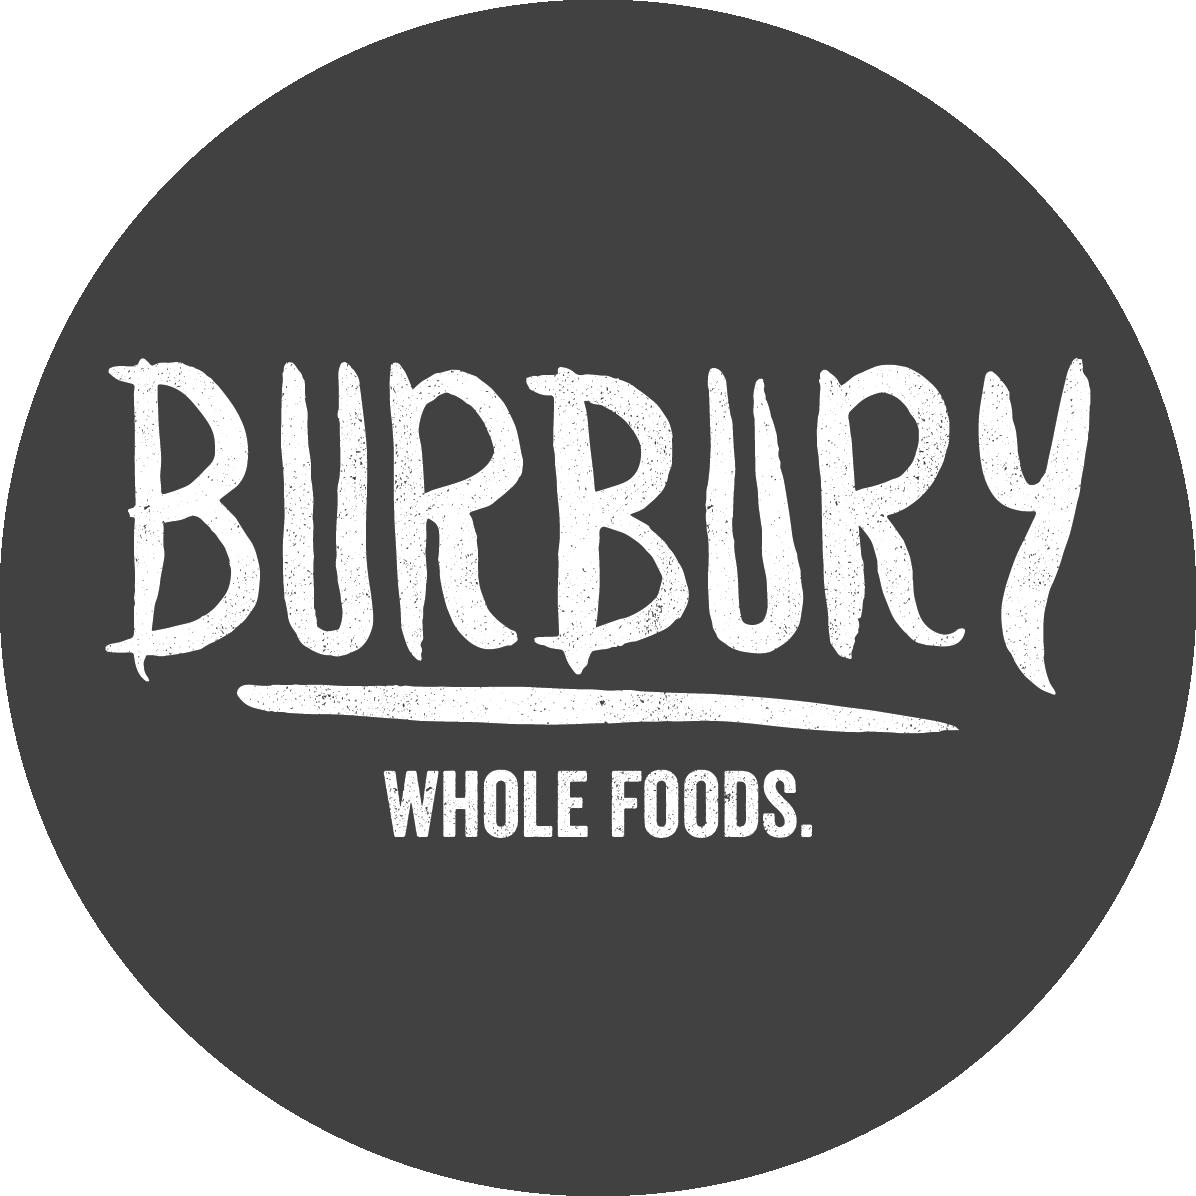 Burbury Whole Foods